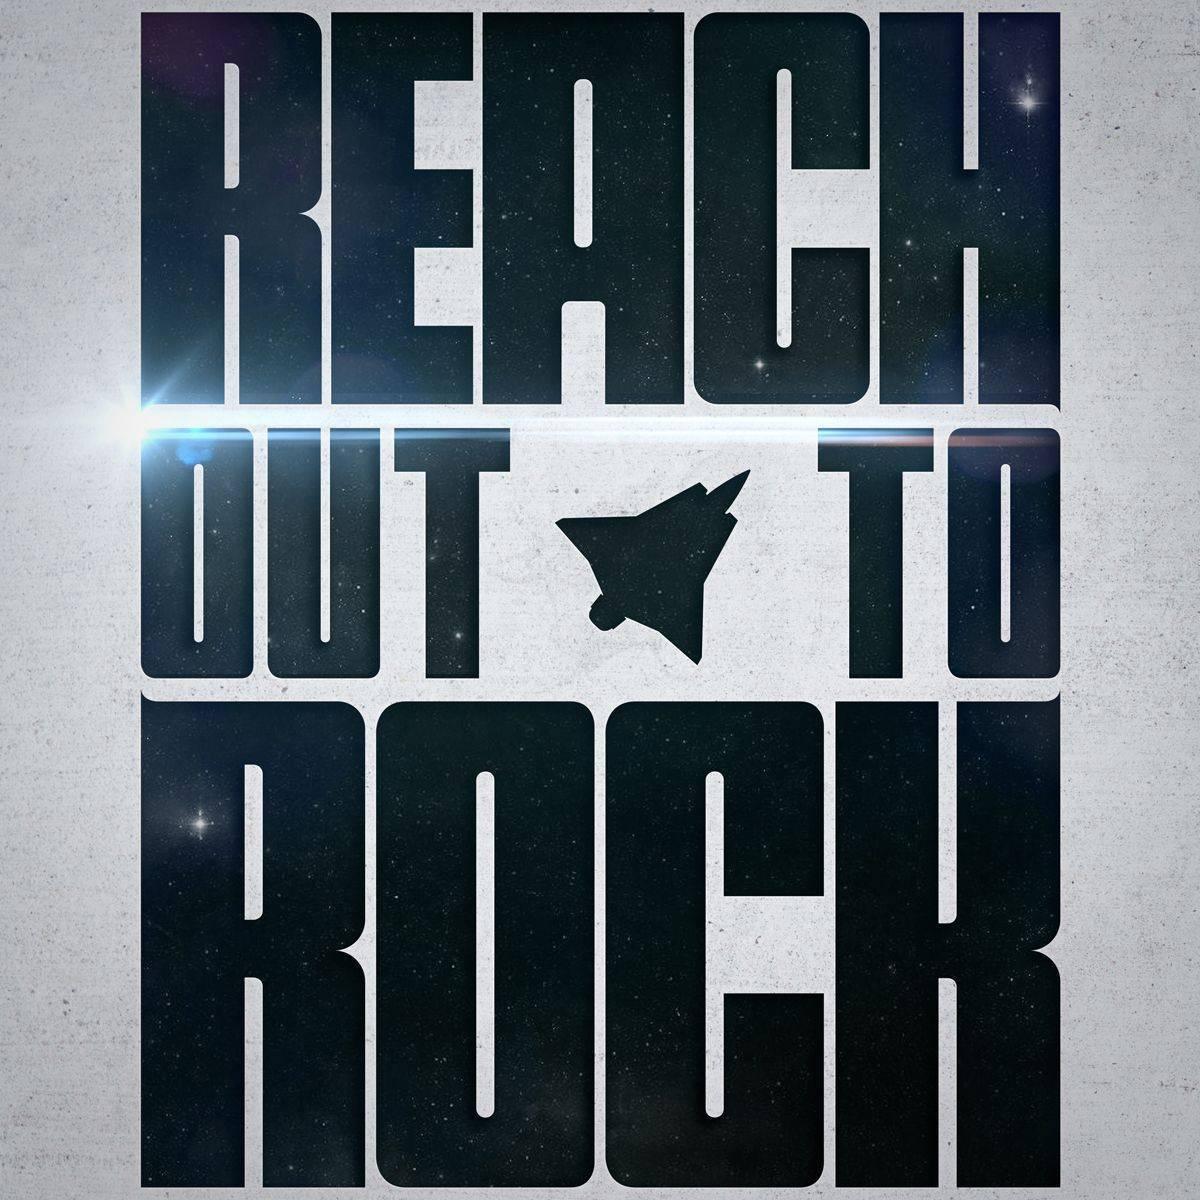 Reach - Reach Out To Rock